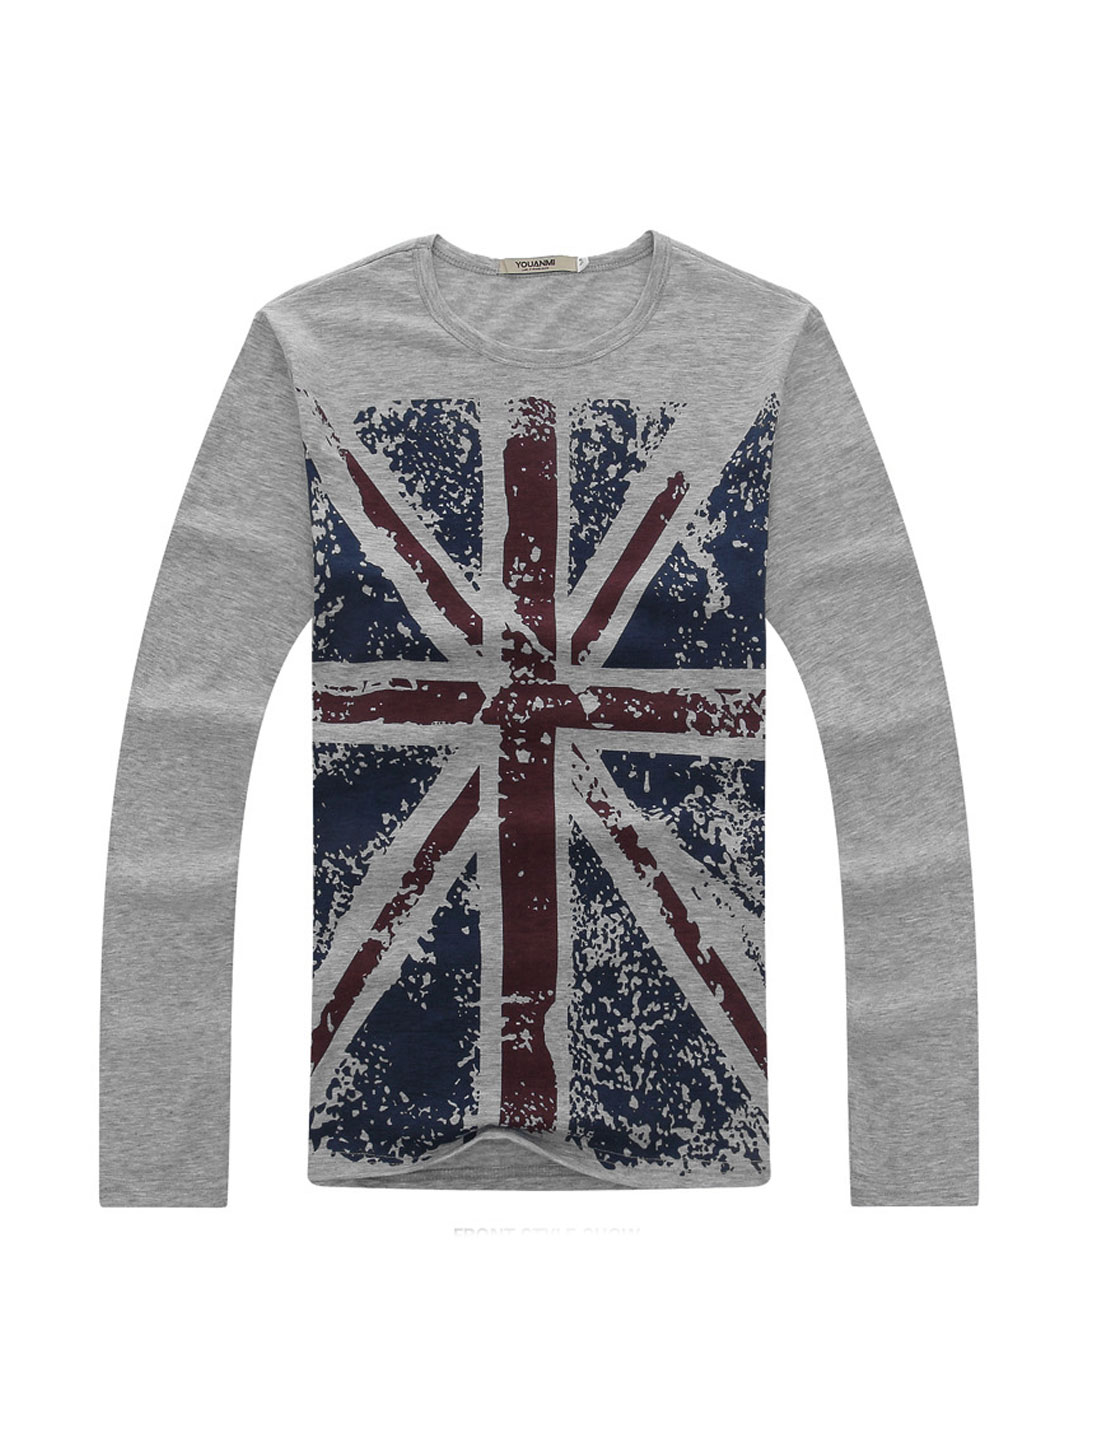 Slim Fit Pullover British Flag Pattern T-shirt for Men Light Gray M